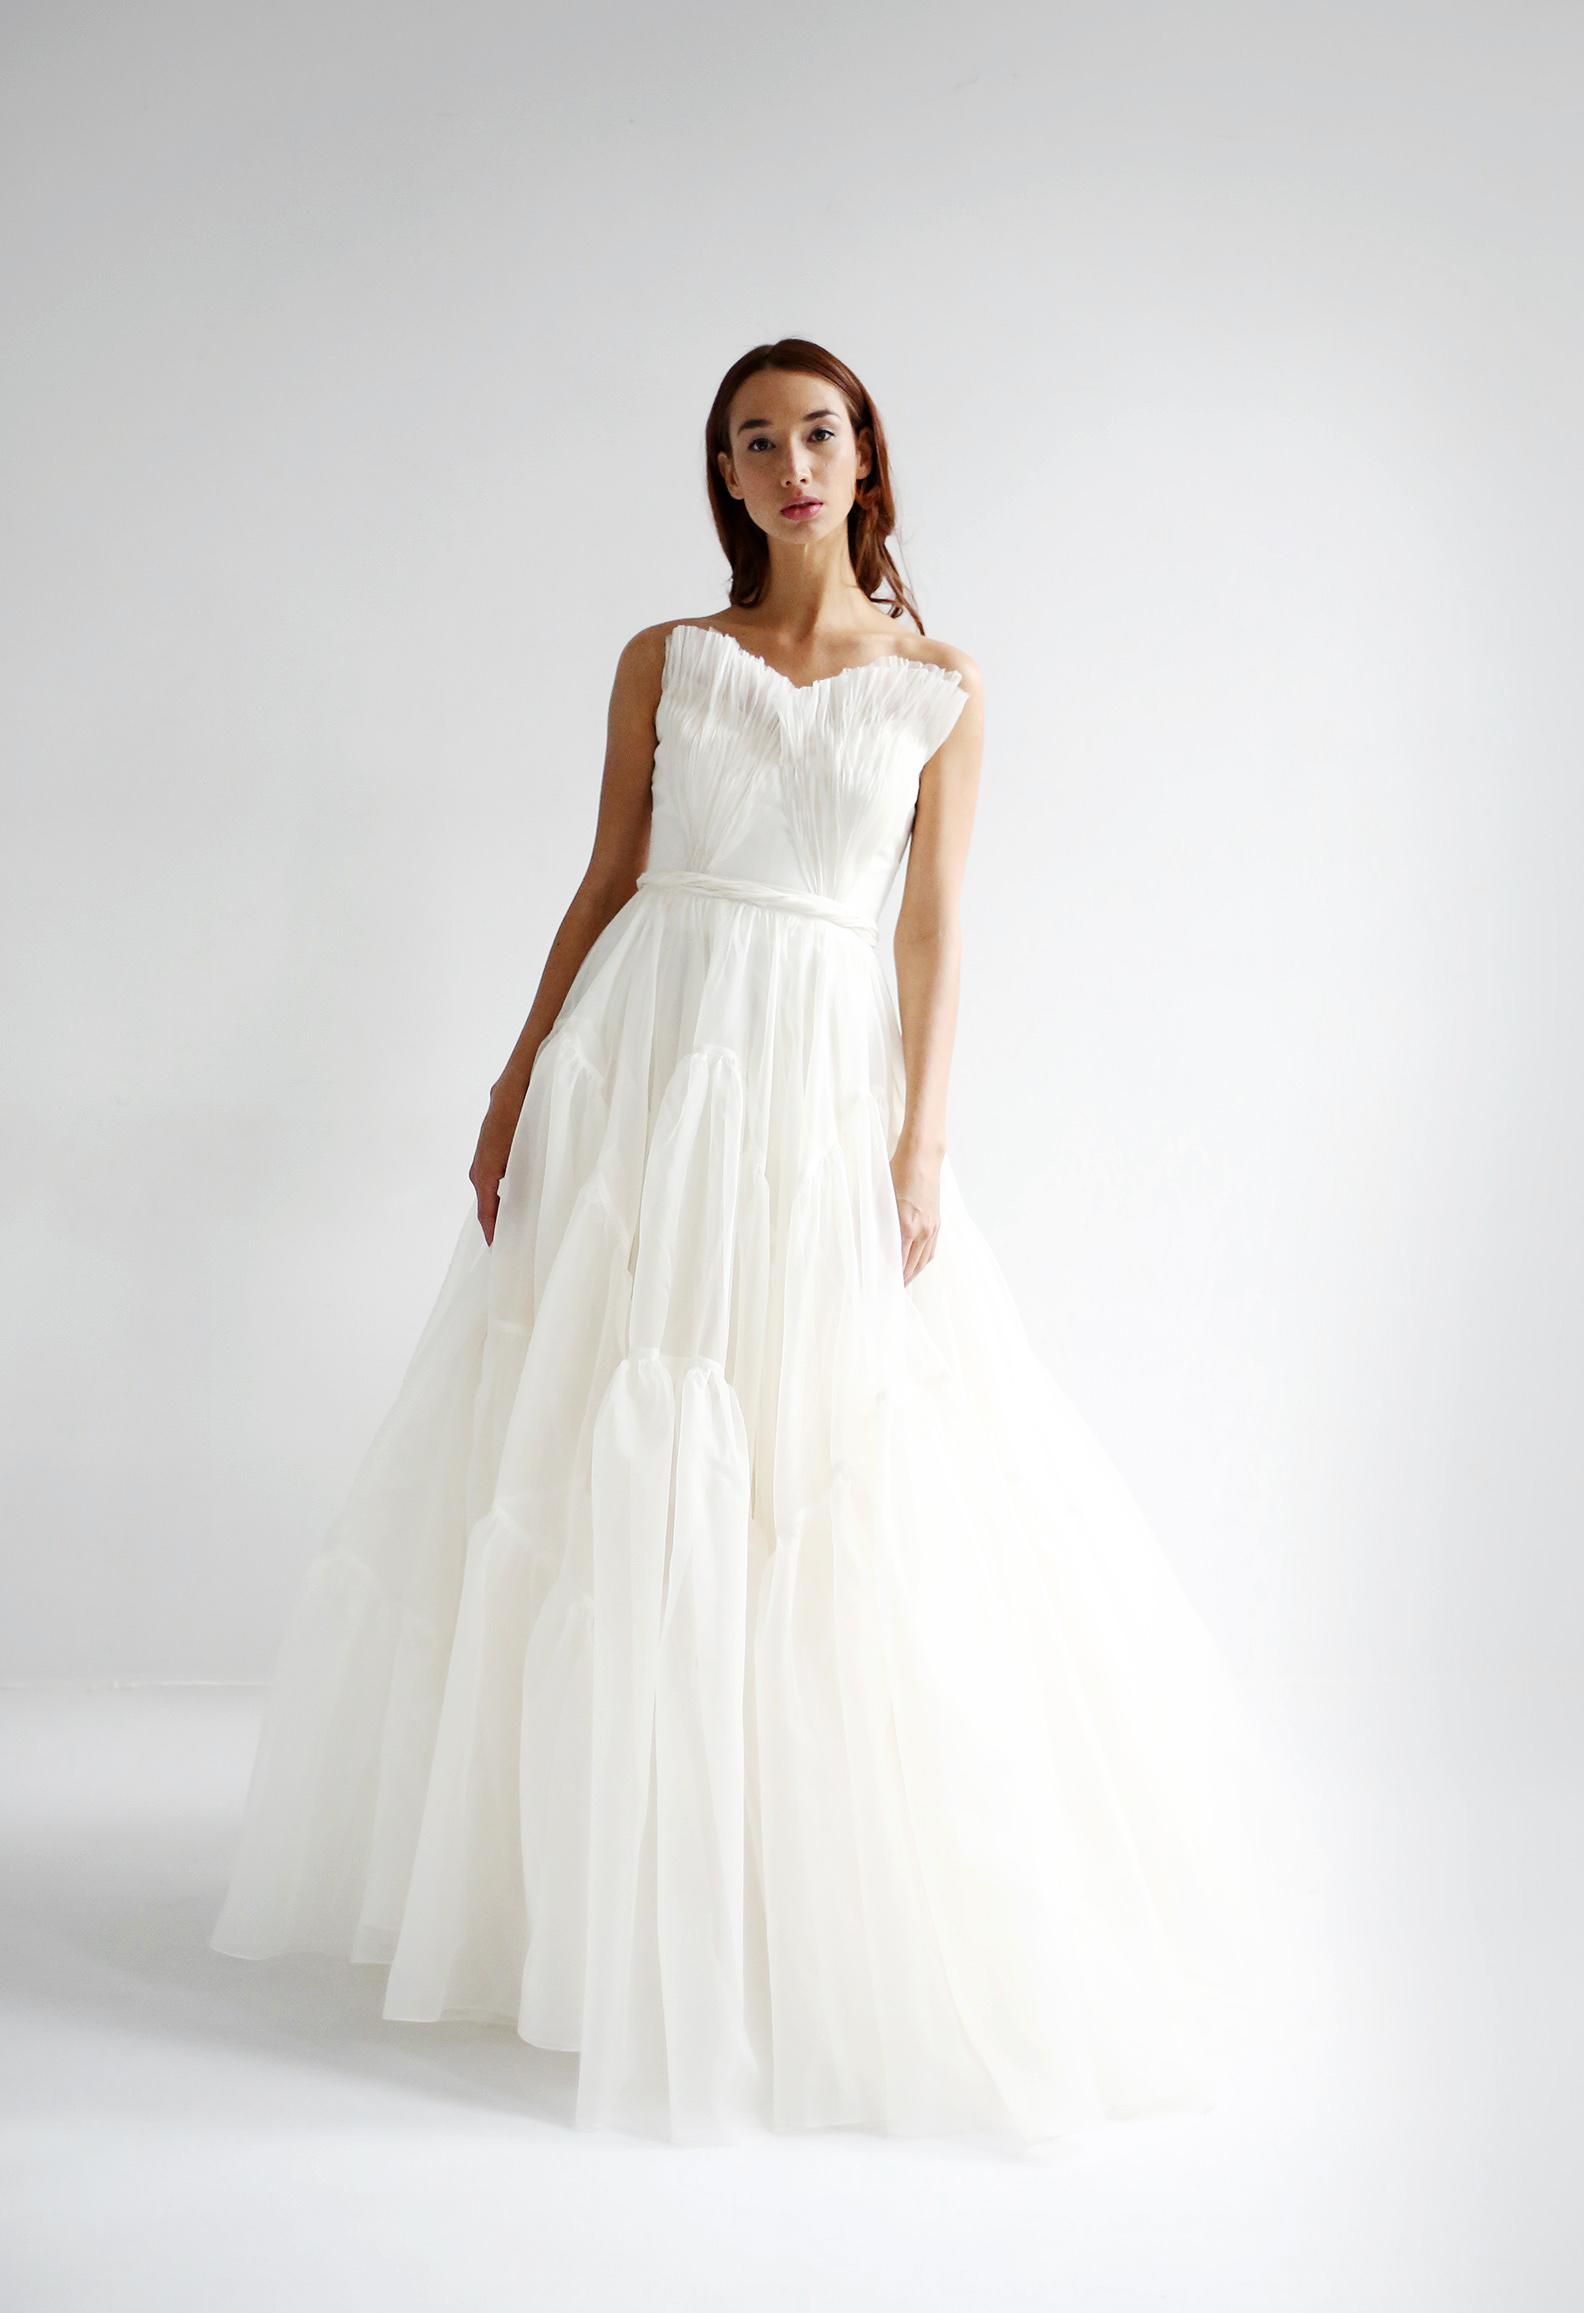 leanne marshall wedding dress spring 2019 strapless ruffles a-line